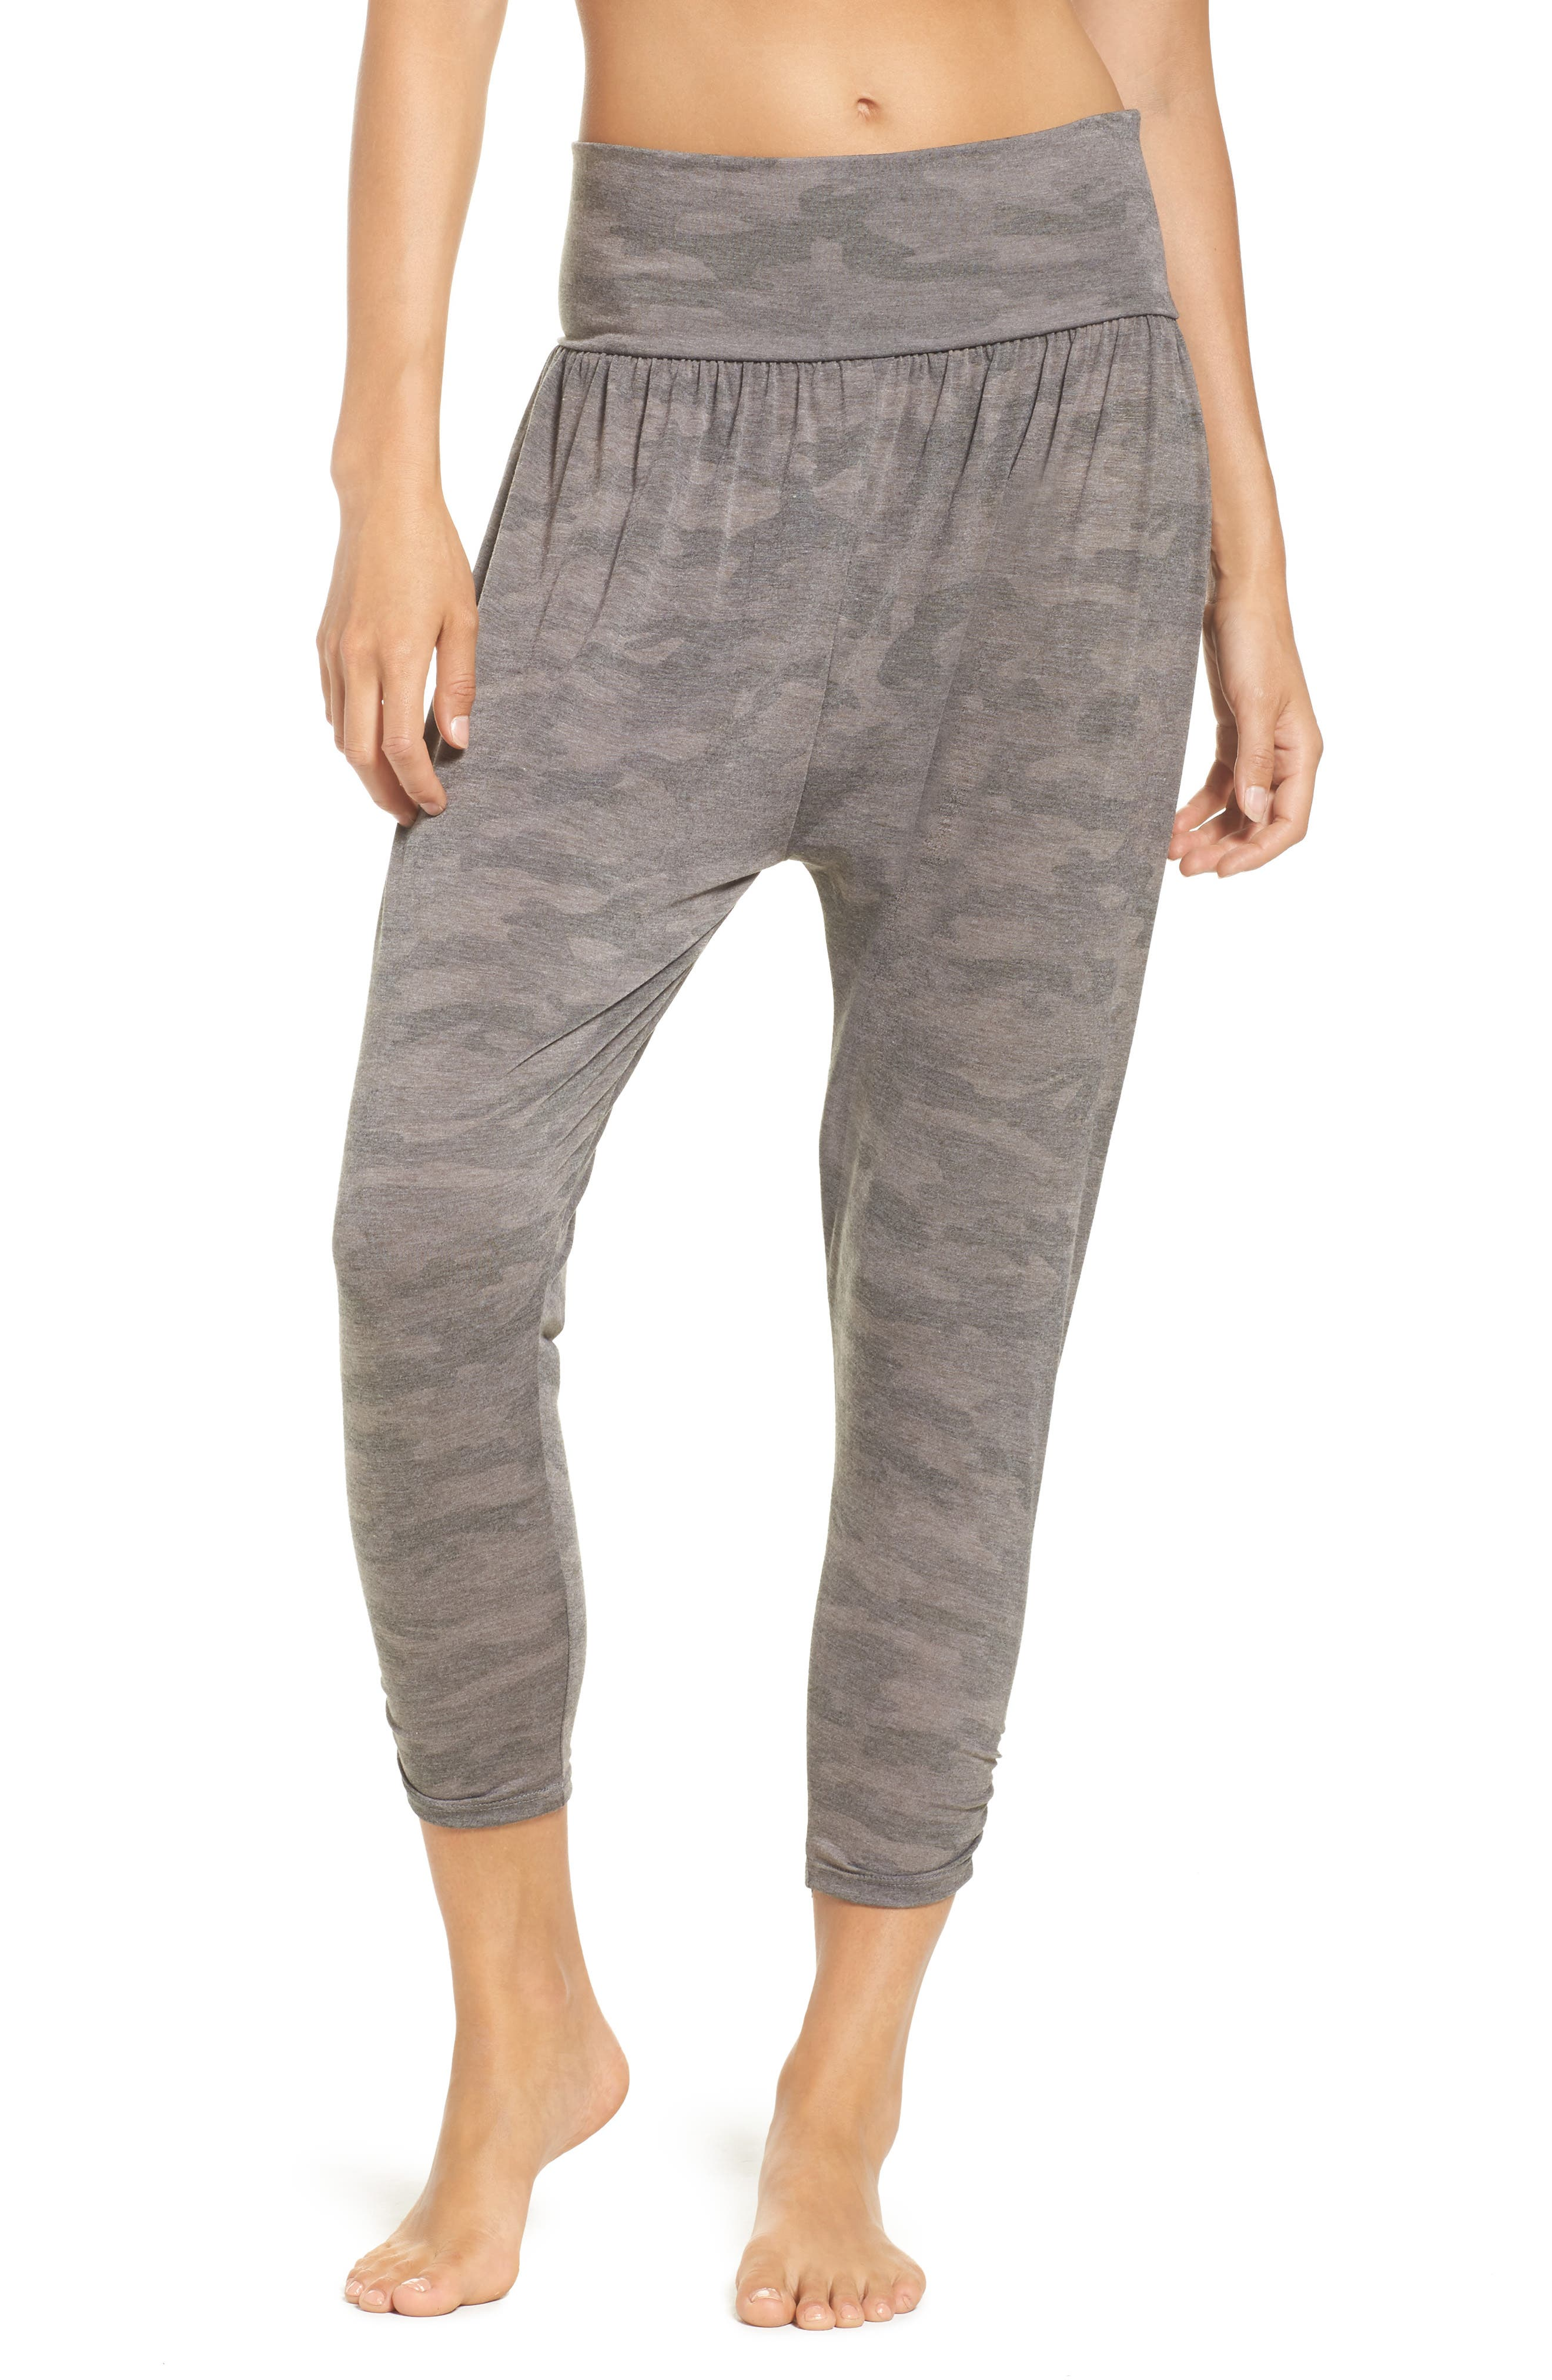 Alternate Image 1 Selected - Onzie Harem Pants